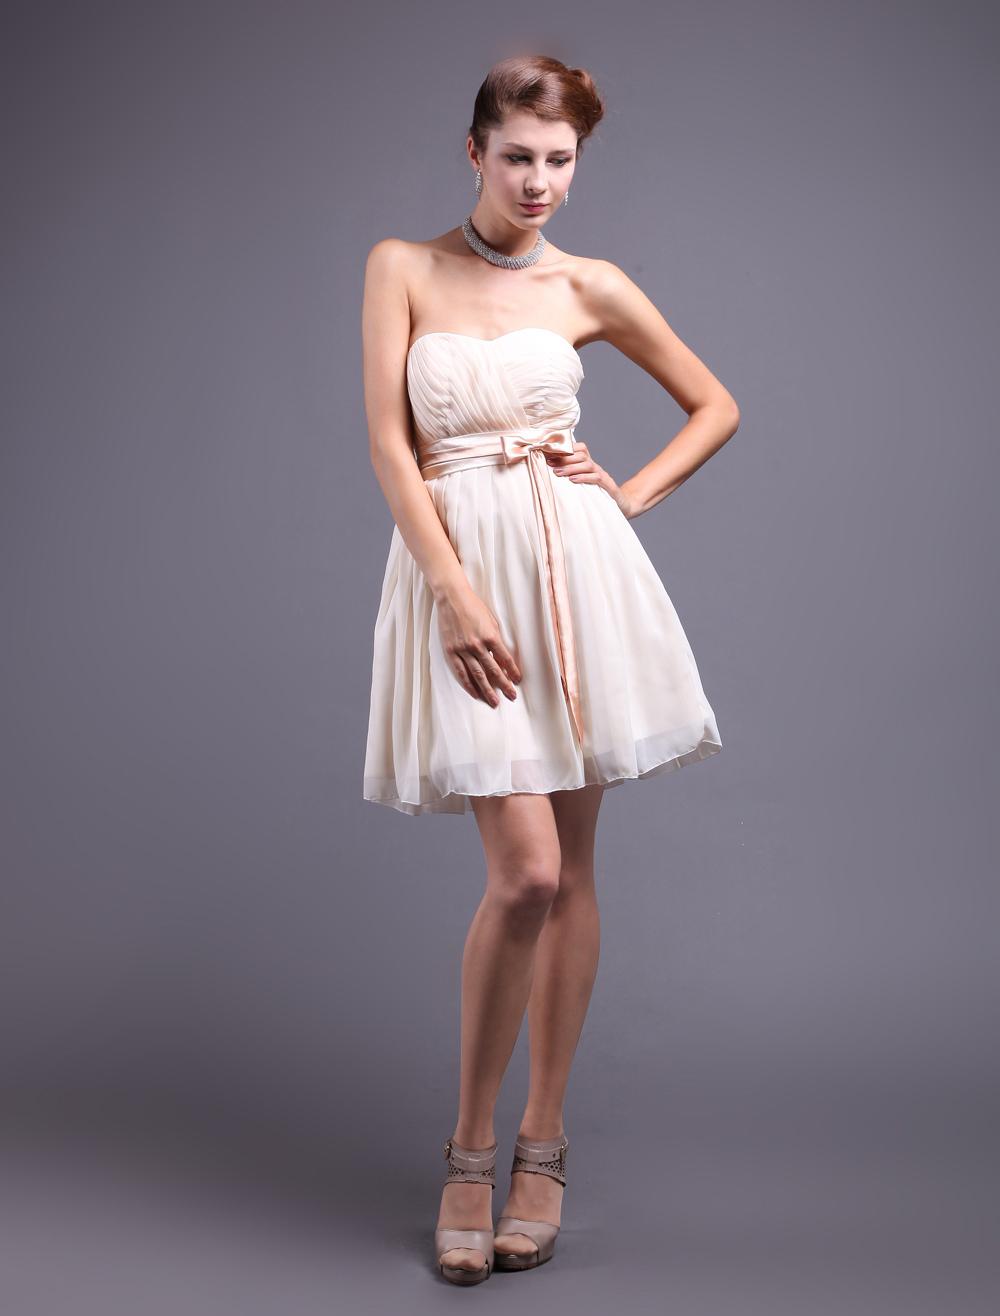 Champagne Chiffon Sweetheart Bow Prom Dress (Wedding Cheap Party Dress) photo